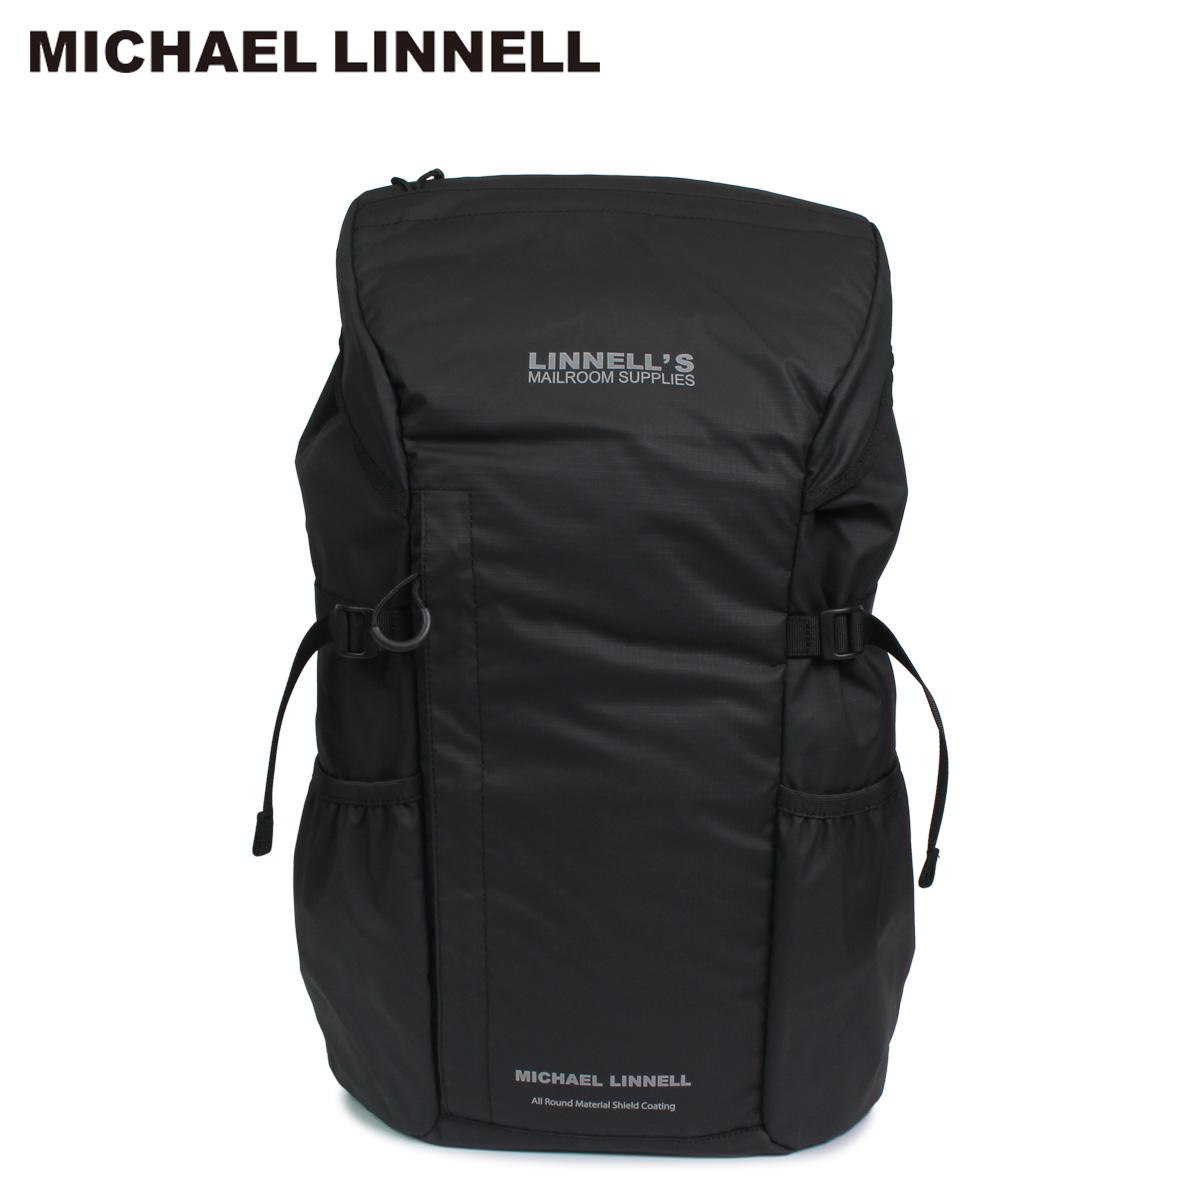 MICHAEL LINNELL ARMS マイケルリンネル リュック バッグ 32L メンズ レディース バックパック MLAC-02